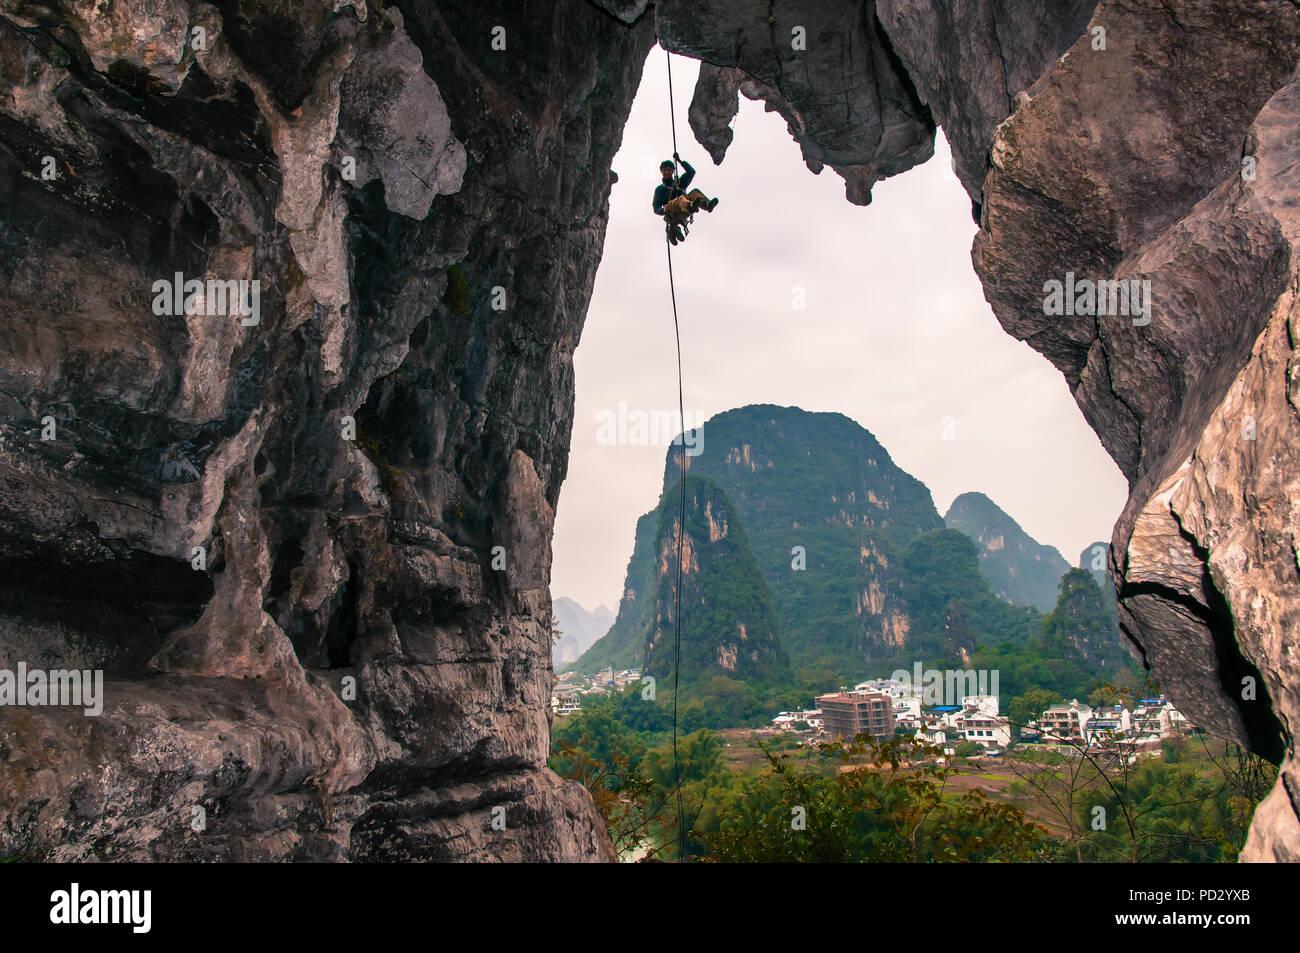 Sport climbing on limestone, in Yangshuo, Guangxi, China - Stock Image